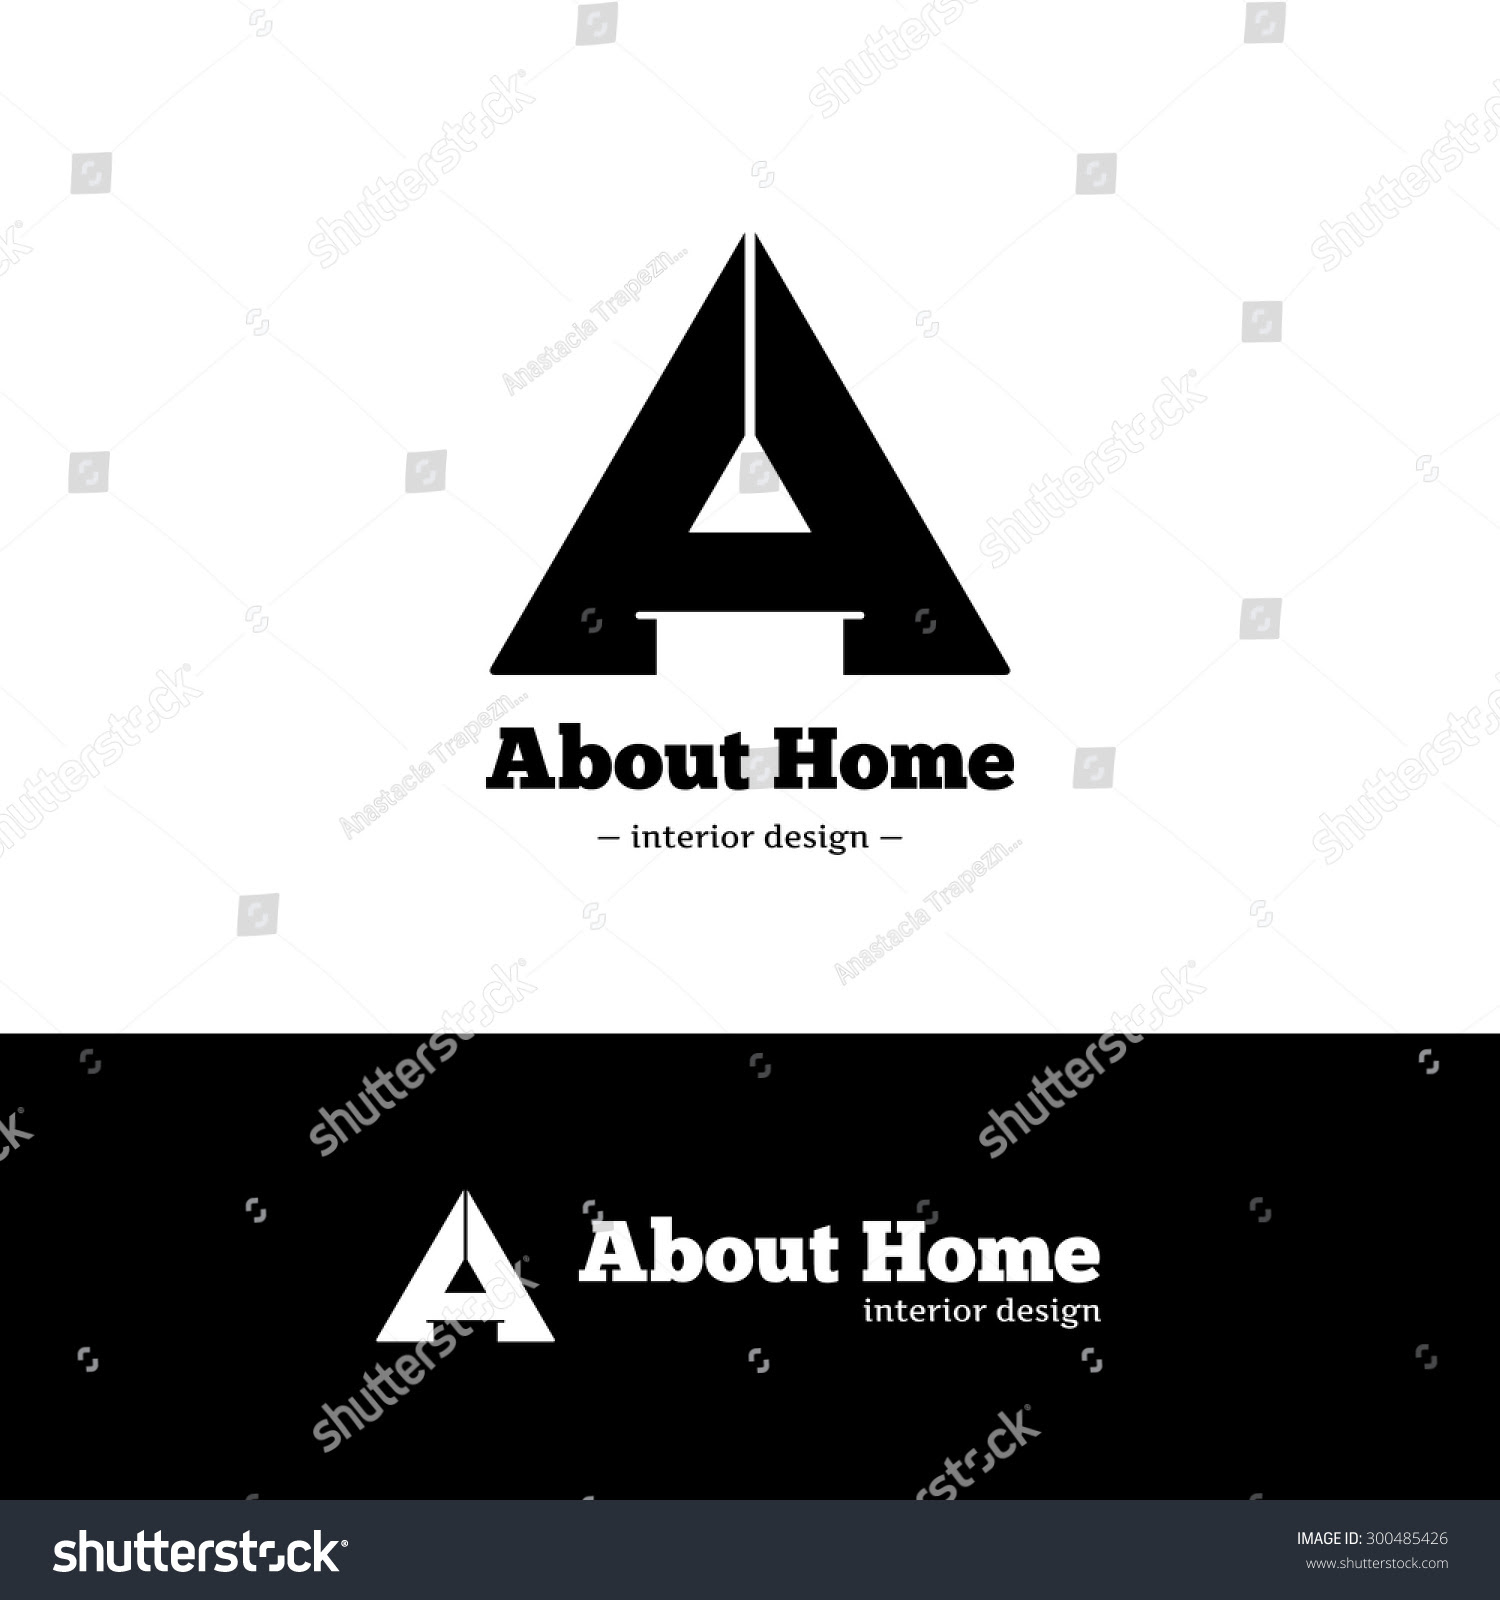 Interior design logo stock vector. Illustration of orange ...